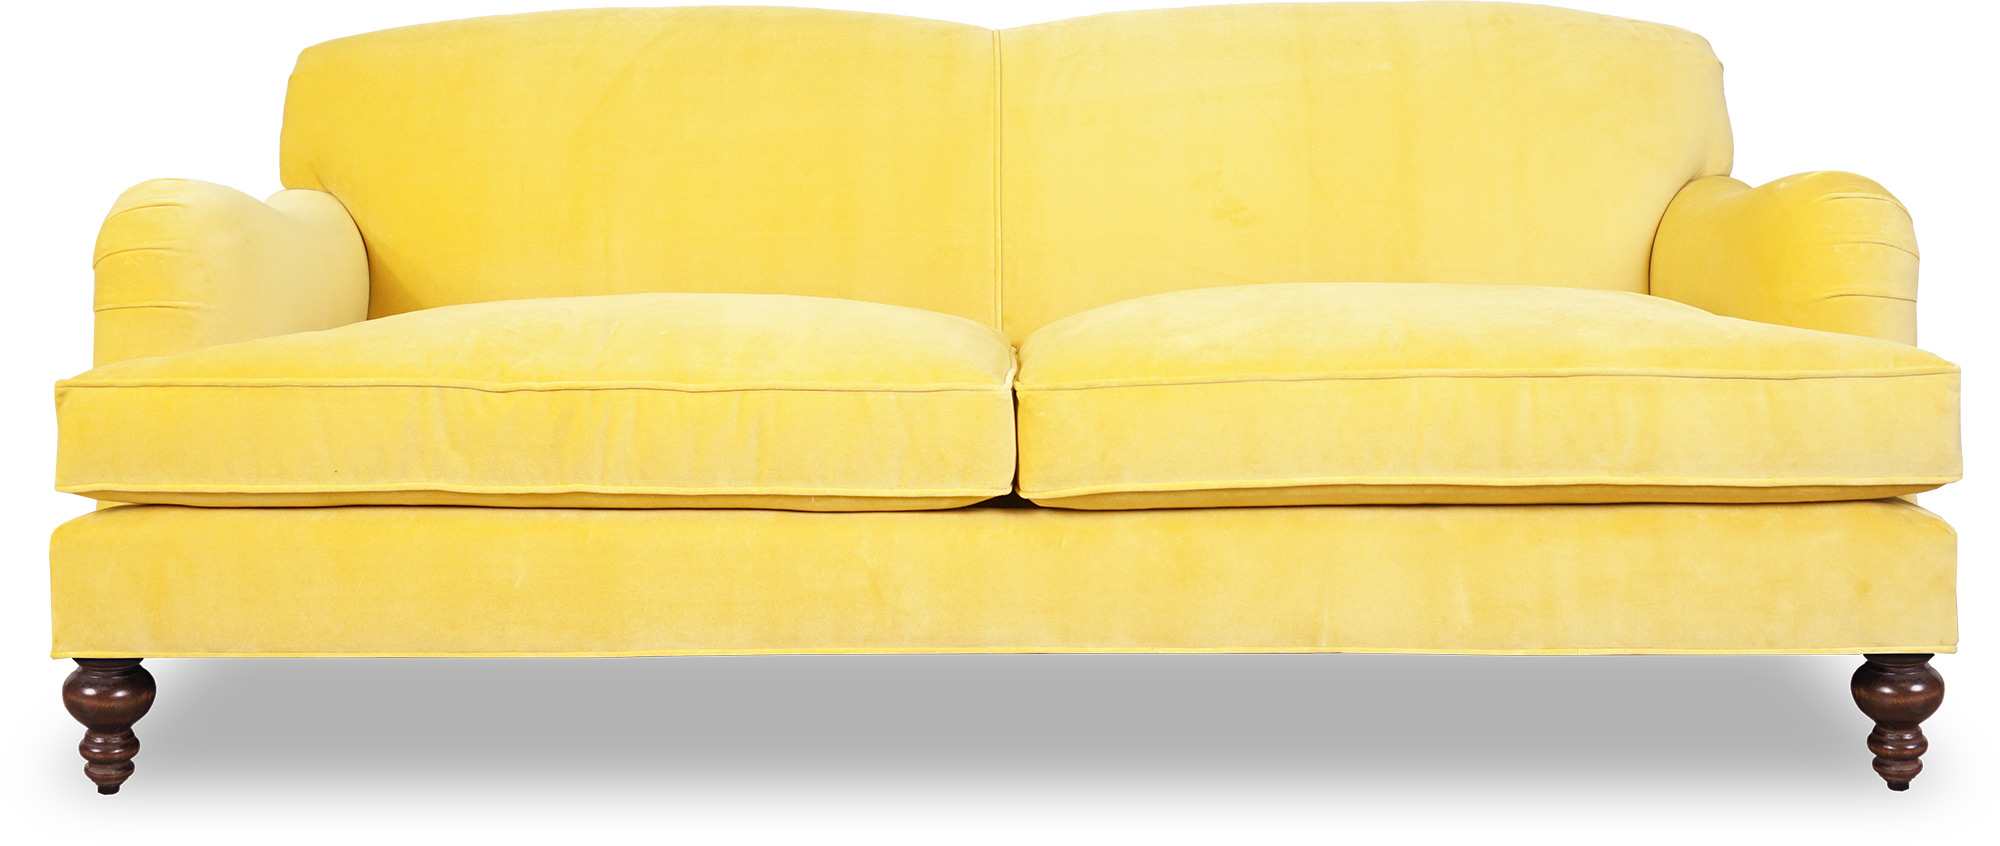 Tight Back English Roll Arm Sofas Armchairs Basel Roger Chris